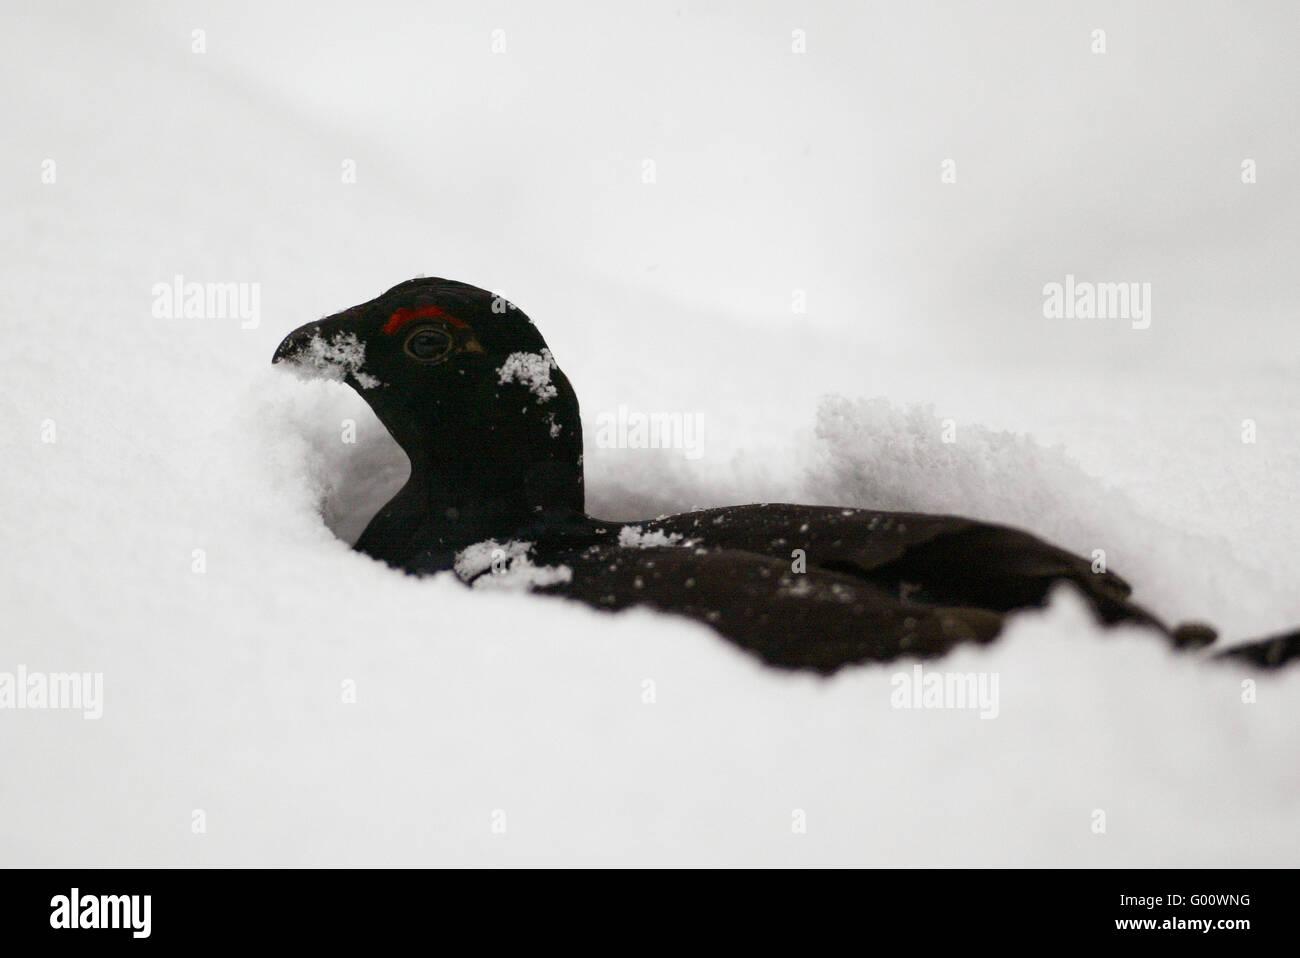 Black Grouse - Stock Image